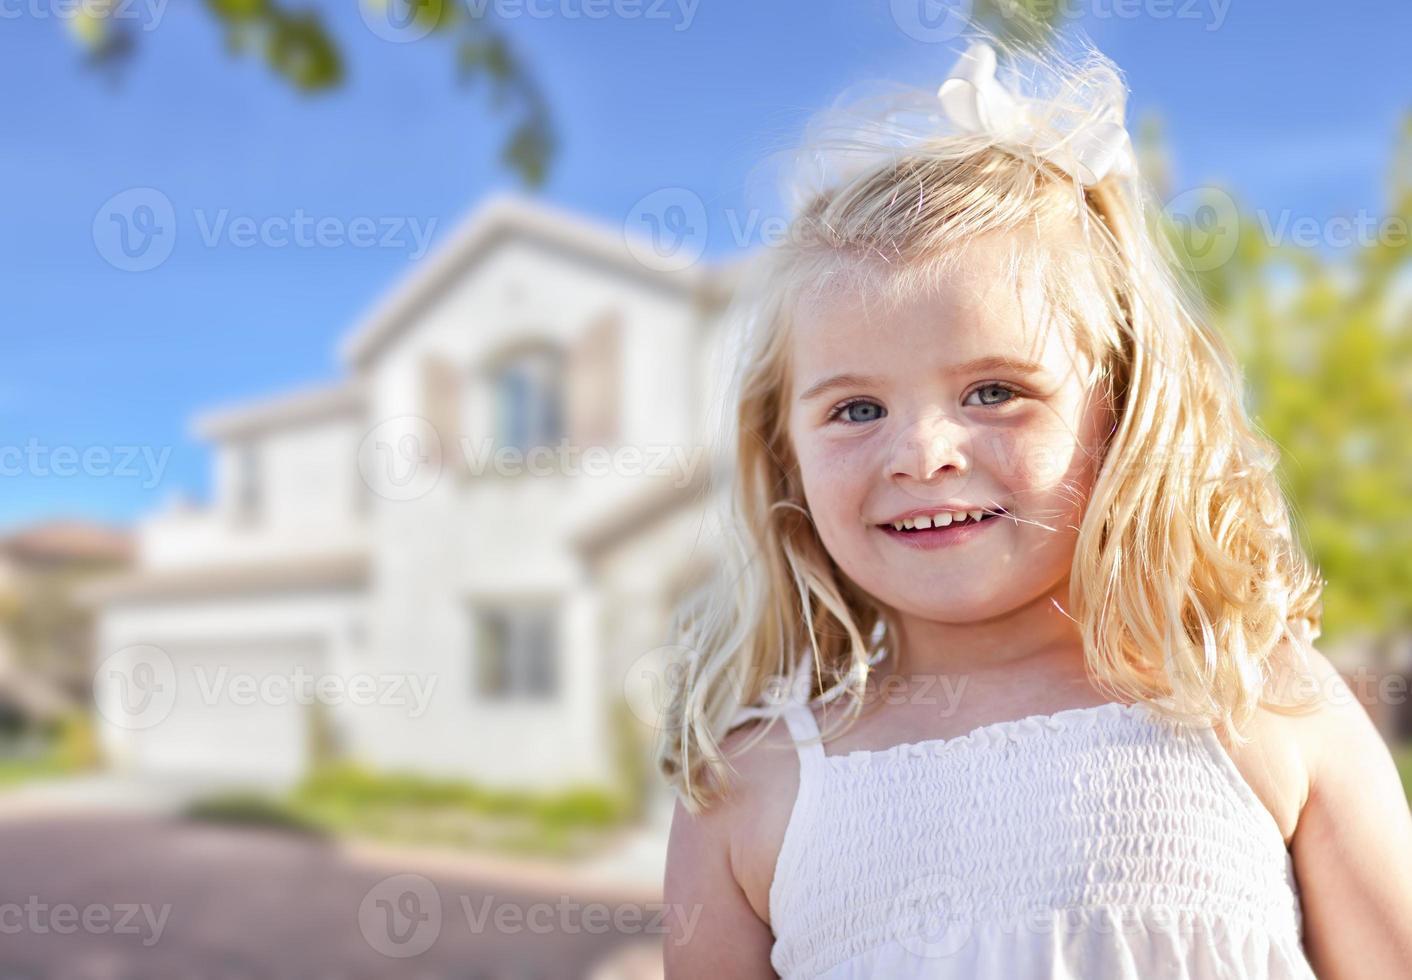 schattig lachend meisje spelen in voortuin foto